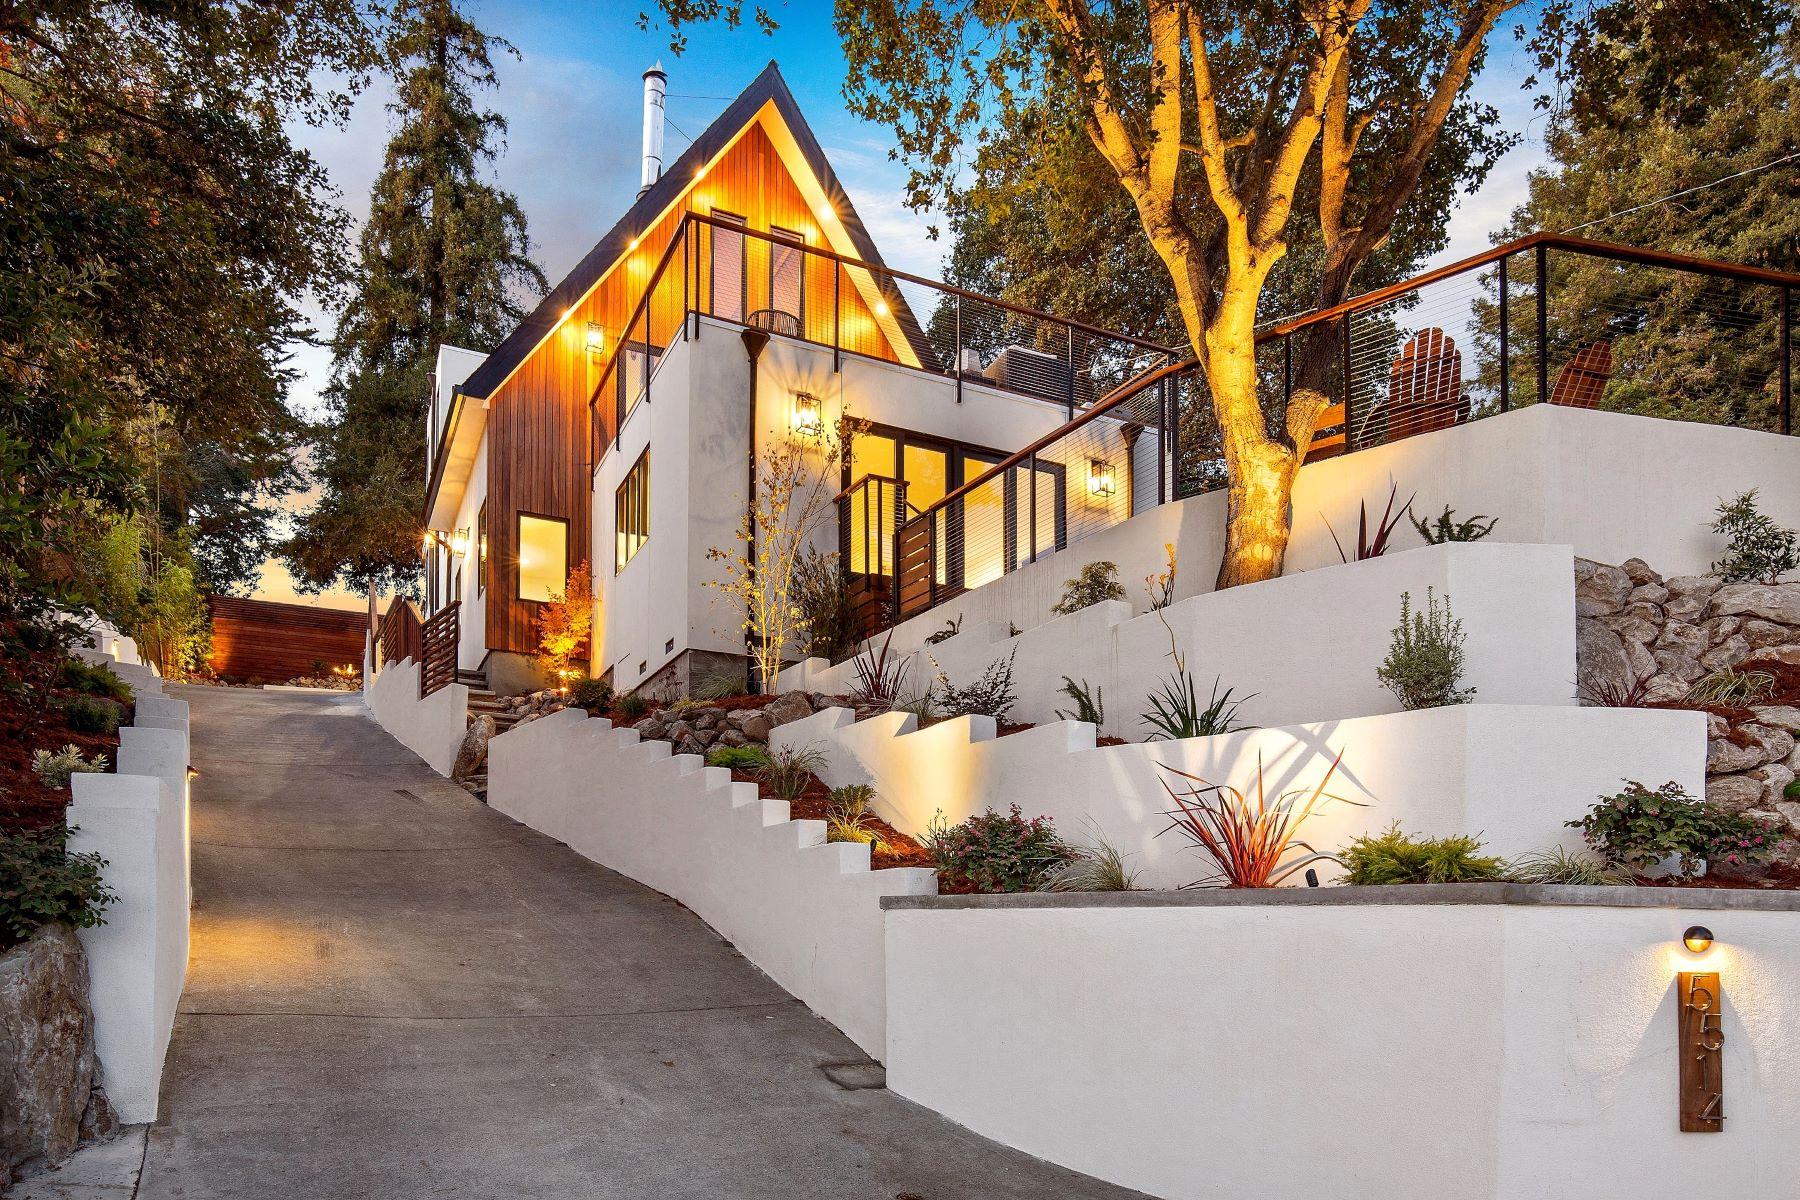 Single Family Homes for Sale at Spectacular Upper Rockridge Chalet 5514 Masonic Avenue Oakland, California 94618 United States